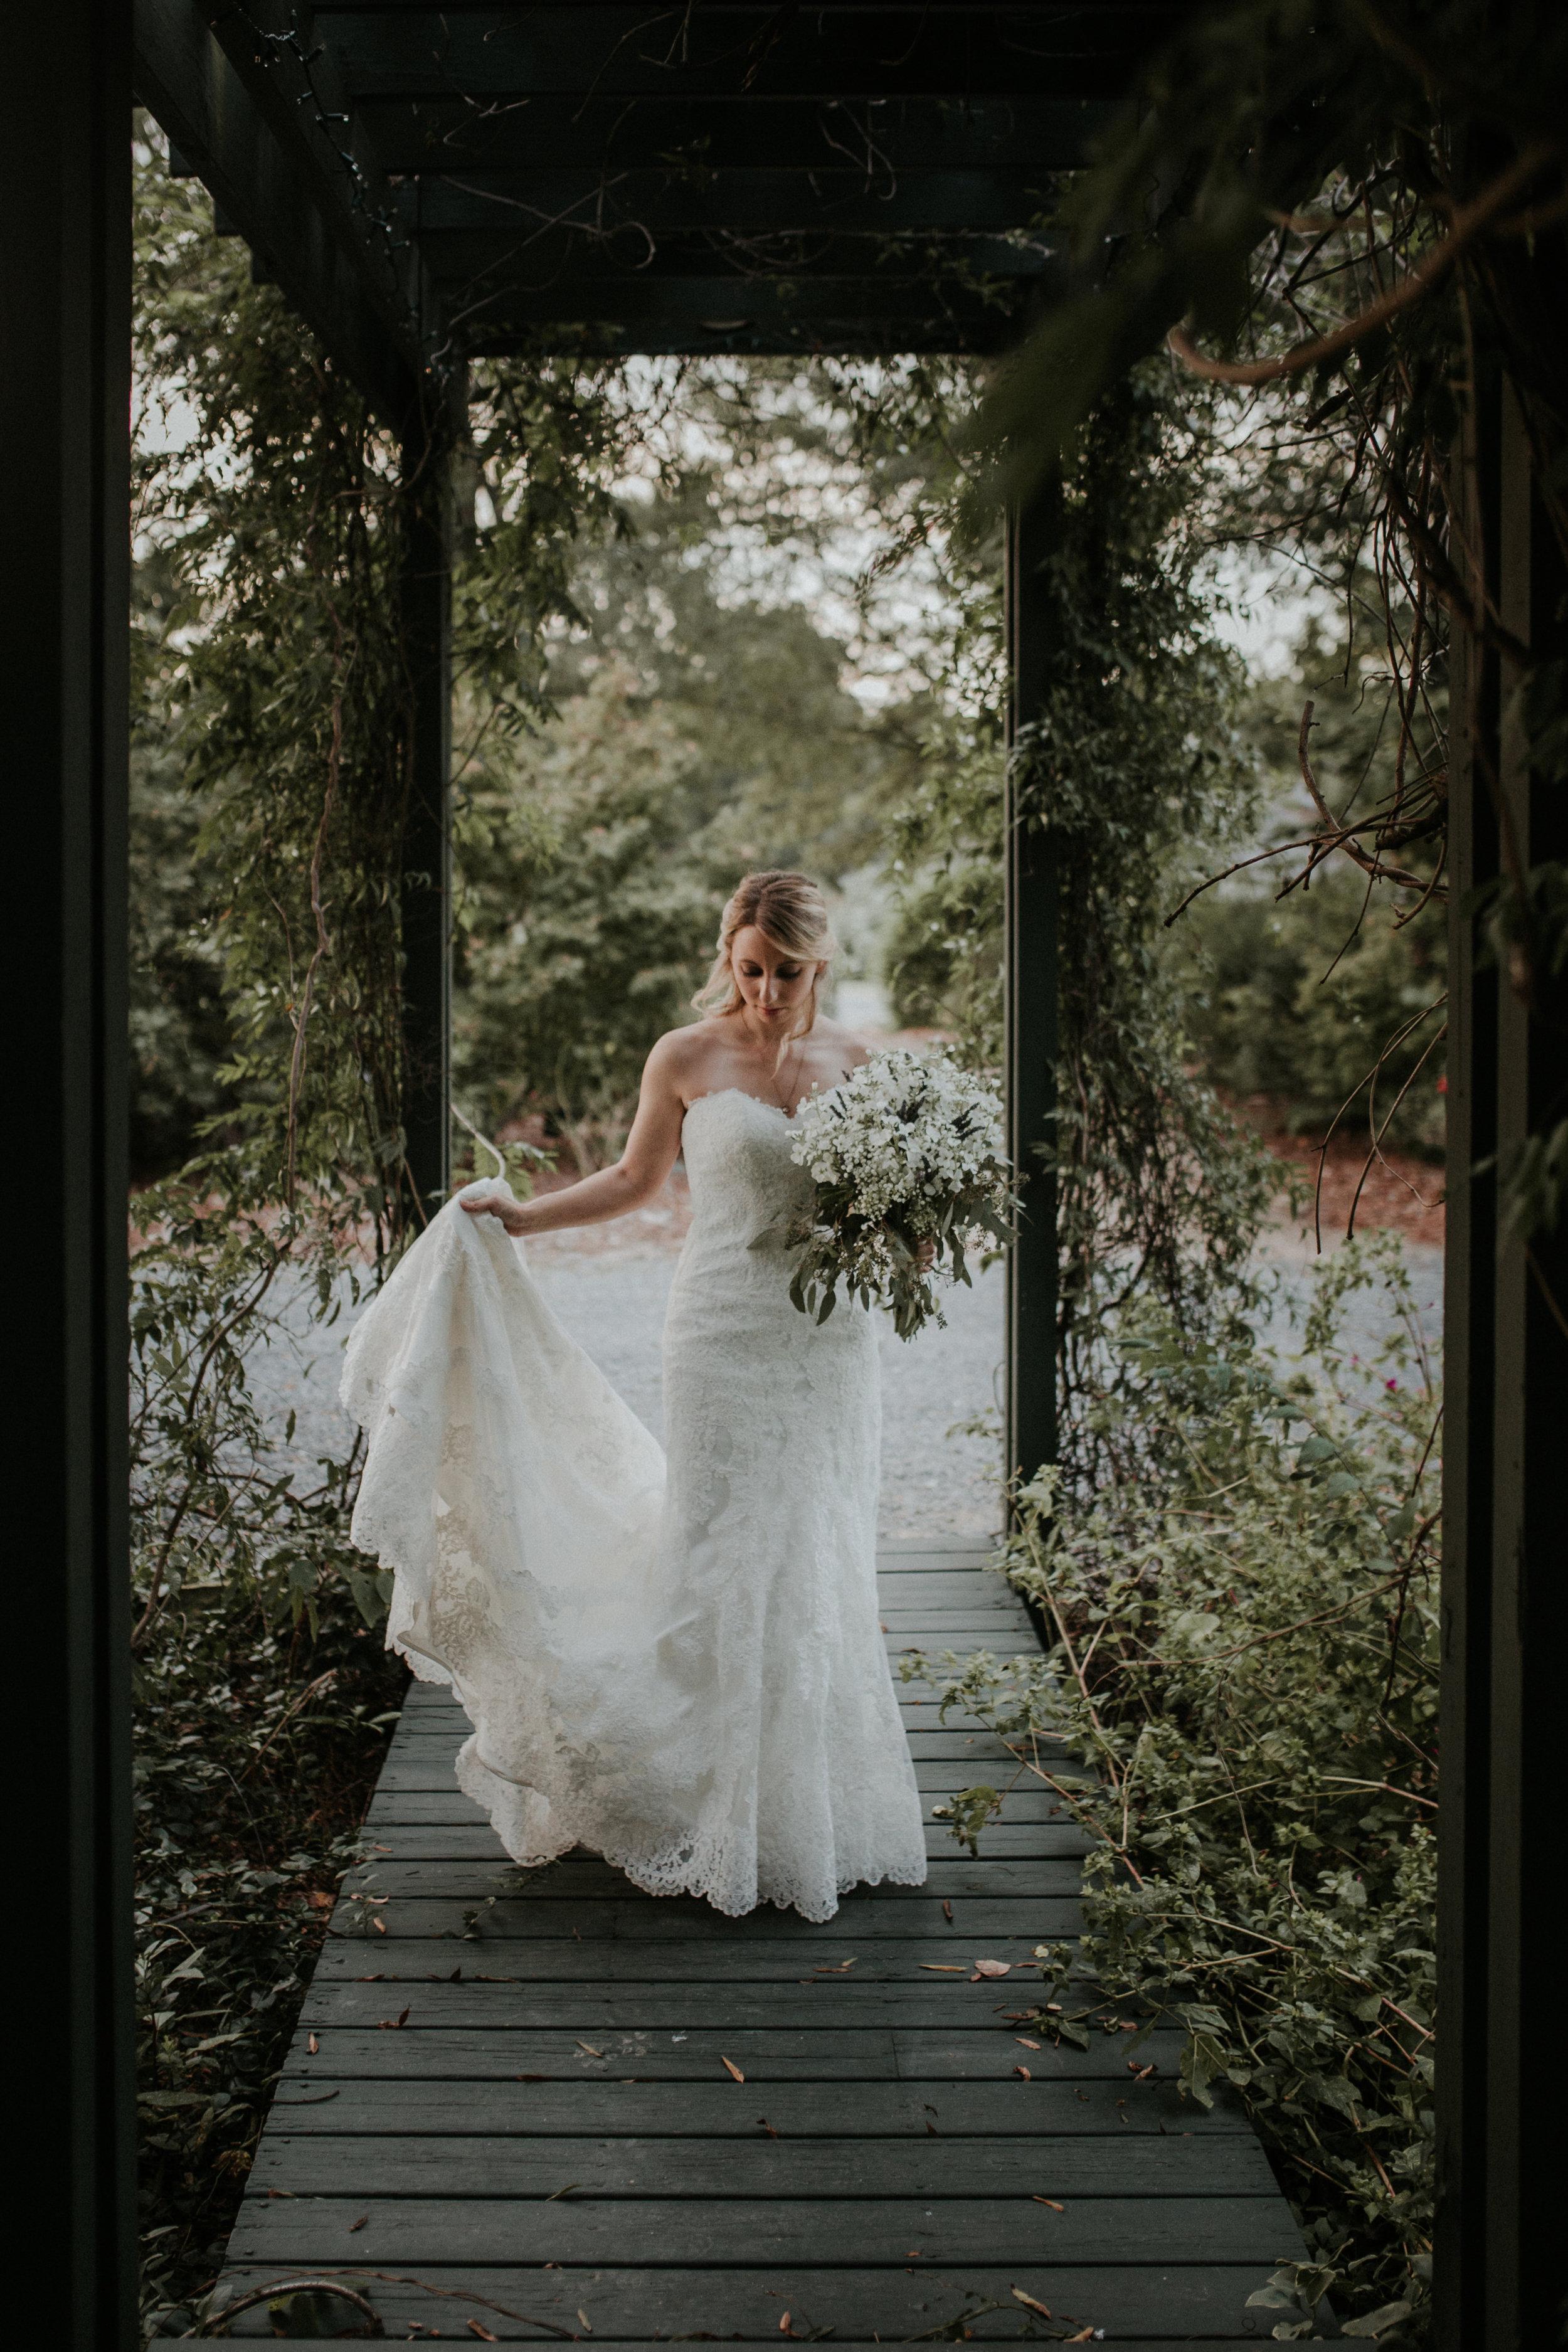 charlotte-wedding-photographer-daniel-stowe-2491.jpg